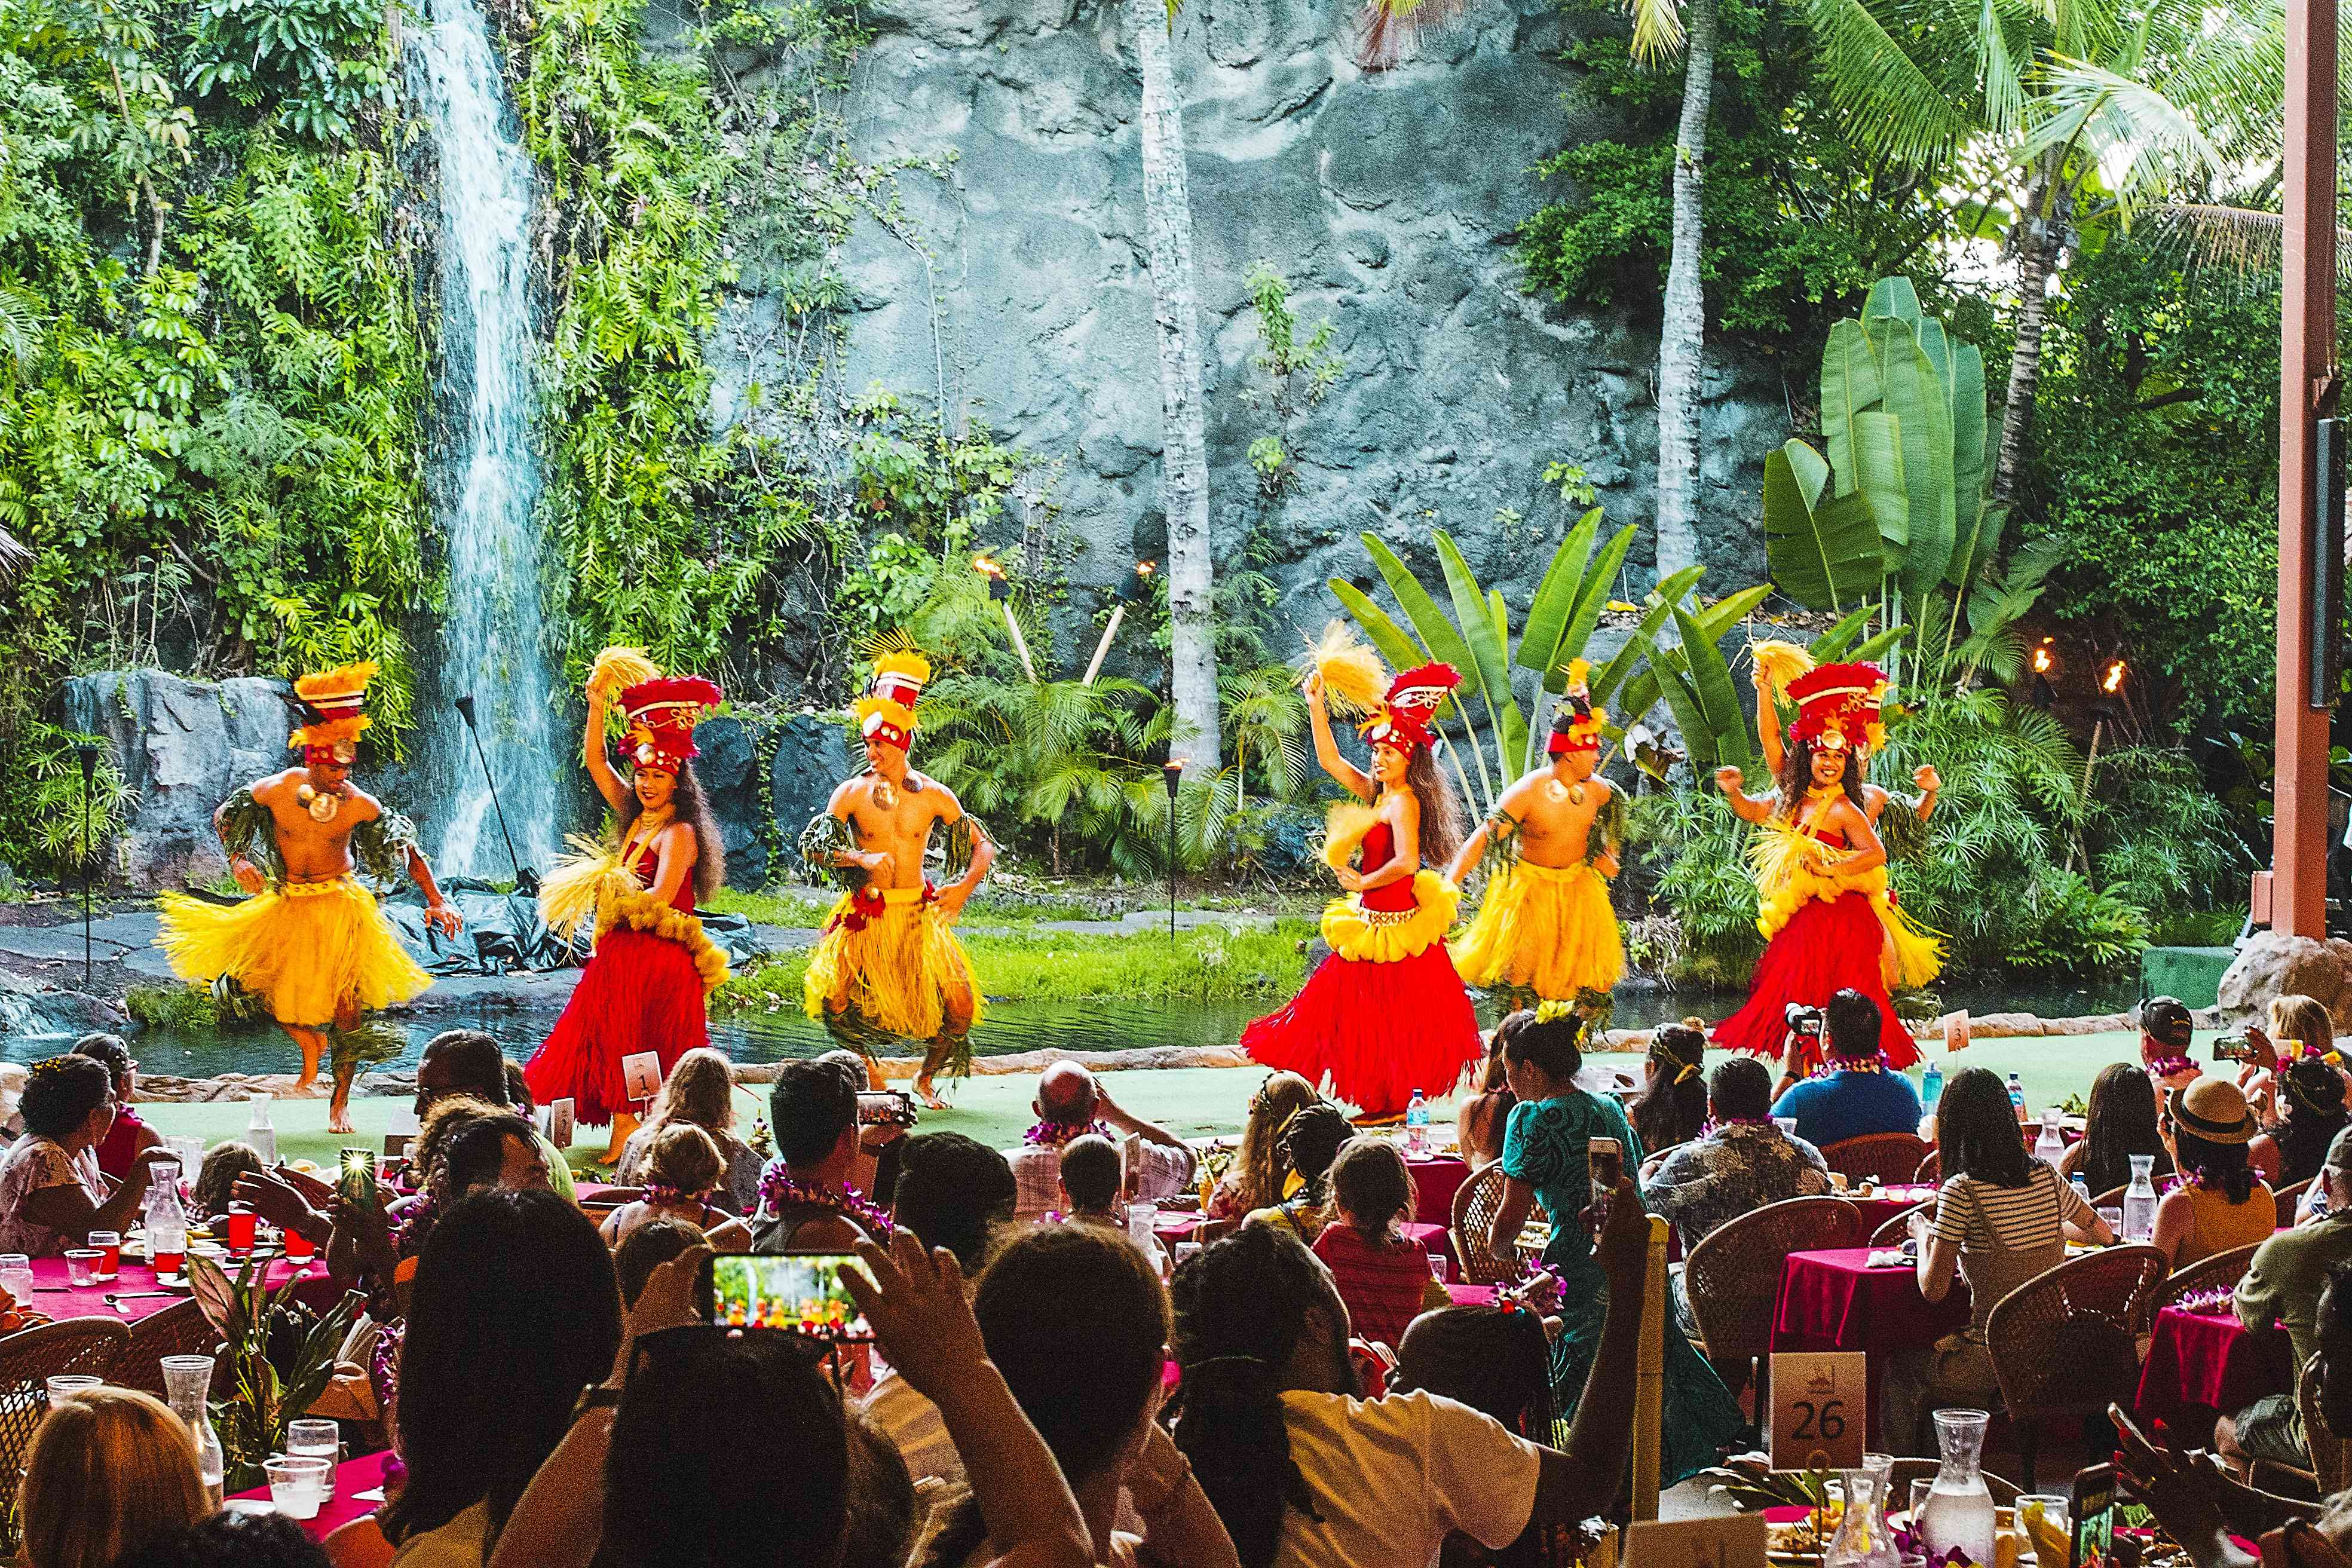 Hula dancers at the Polynesian Cultural Center's Luau